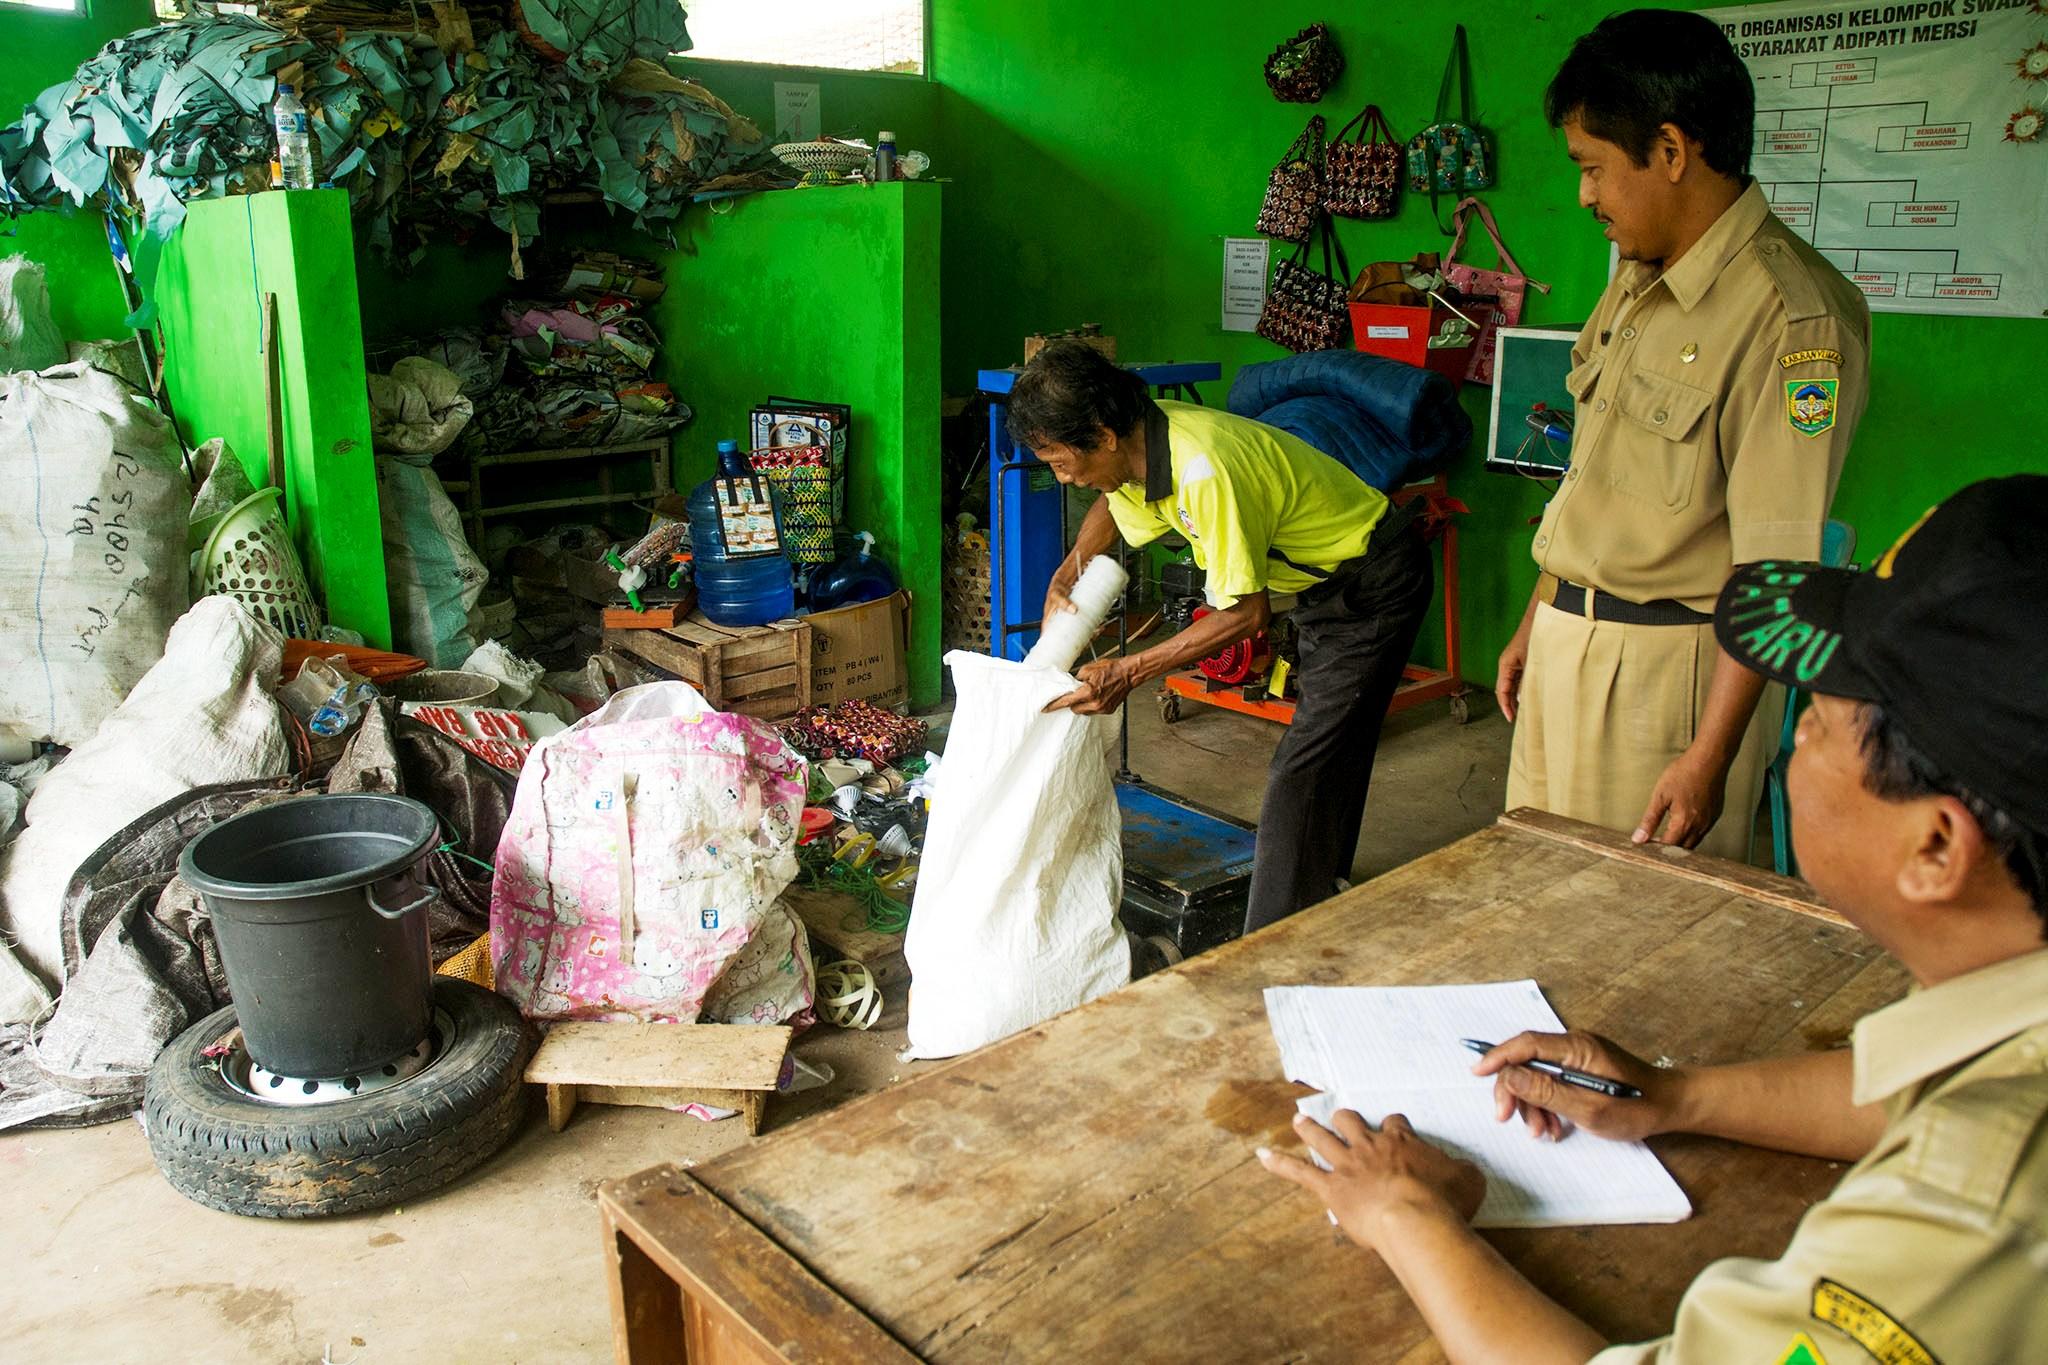 Seorang pria tengah menyetorkan sampah ke Tempat Pengolahan Sampah Terpadu (TPST) Kelurahan Mersi, Kecamatan Purwokerto Timur